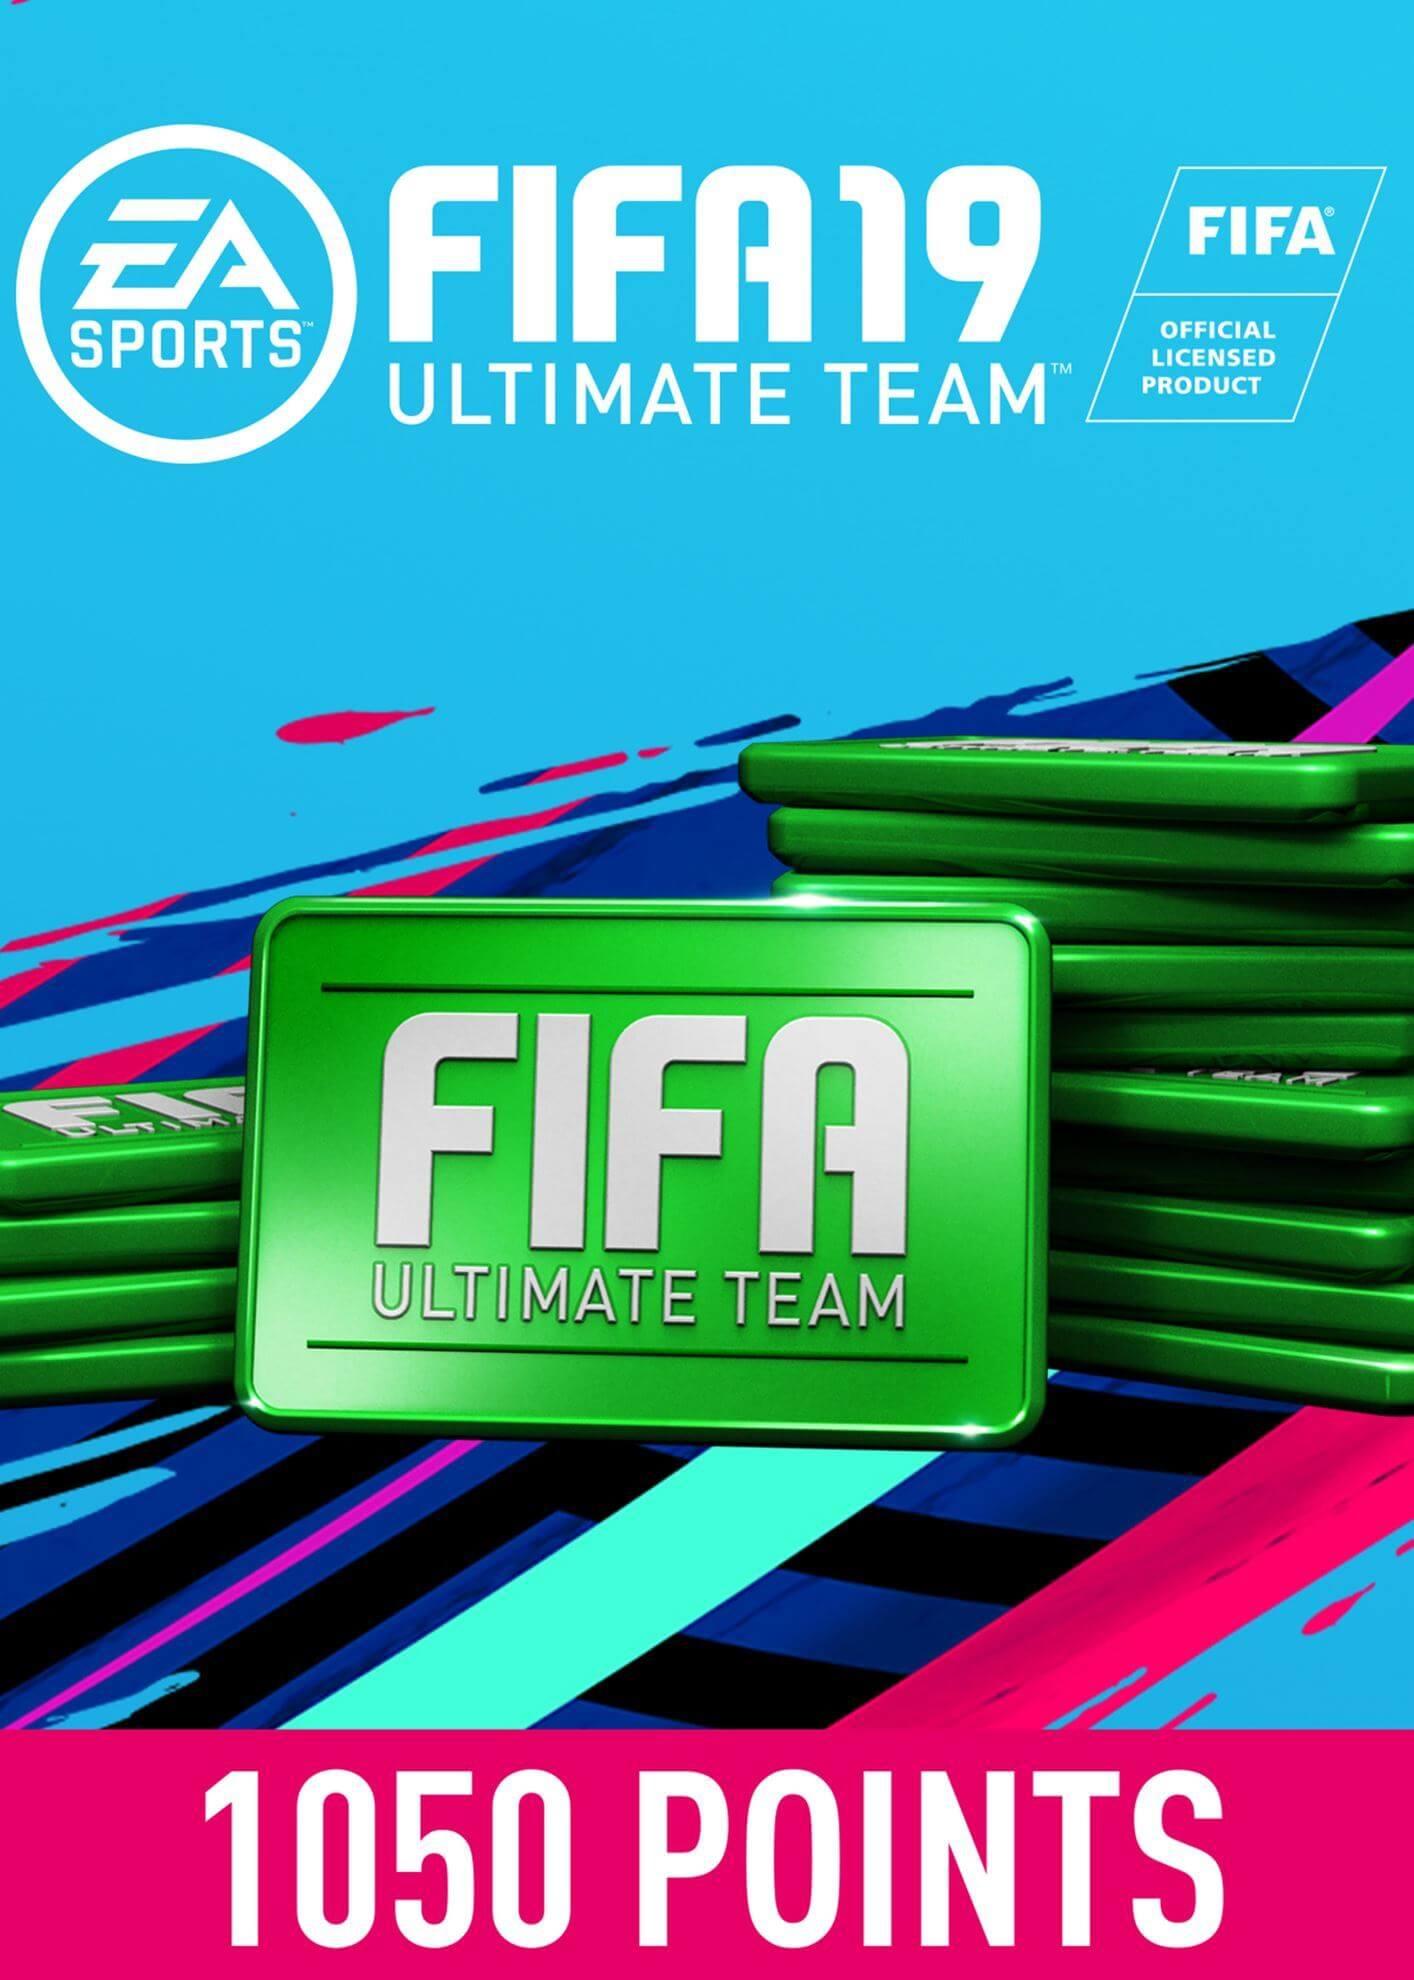 FIFA 19 ULTIMATE TEAM FIFA POINTS 1050